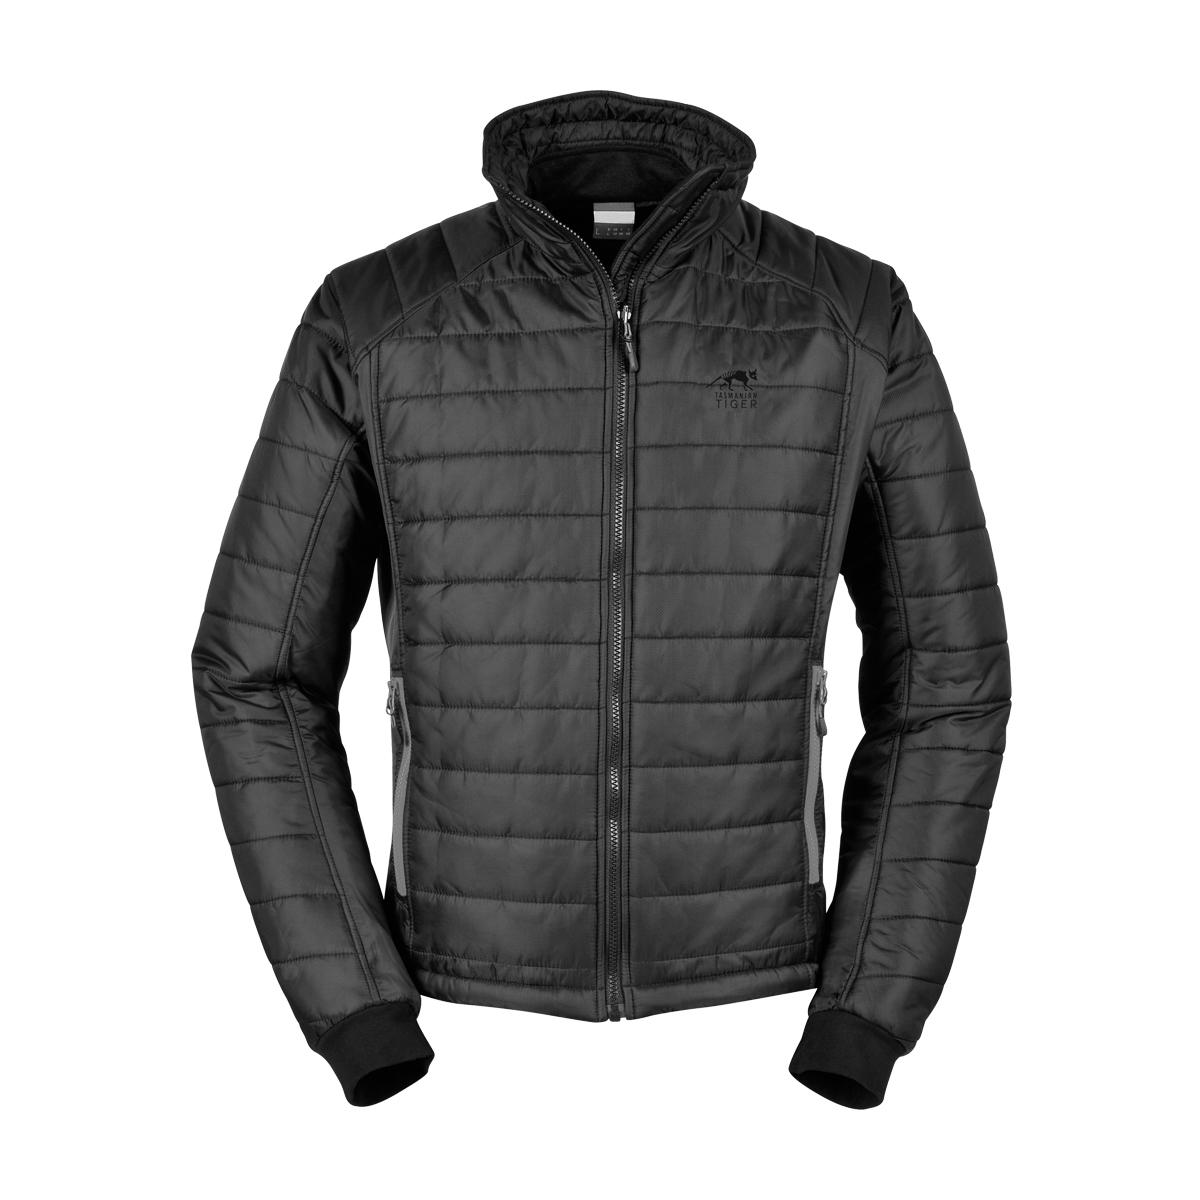 Купить Куртка TT ARIZONA MK II black, 7657.040, Tasmanian Tiger